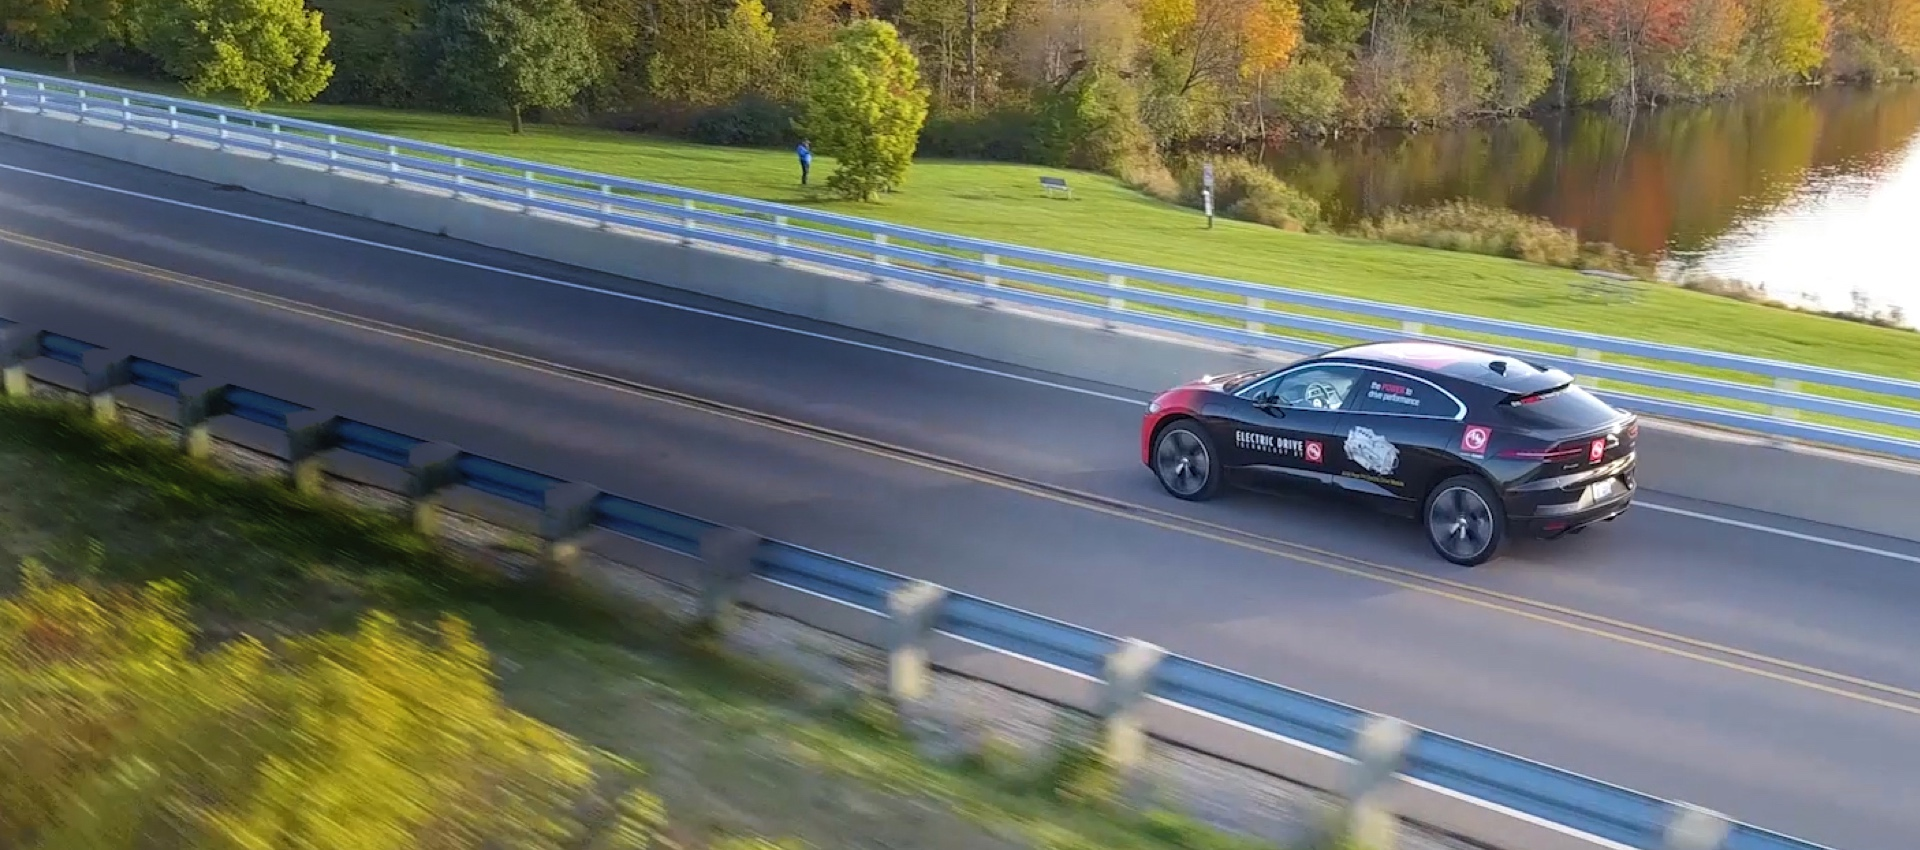 Jaguar iPace on road